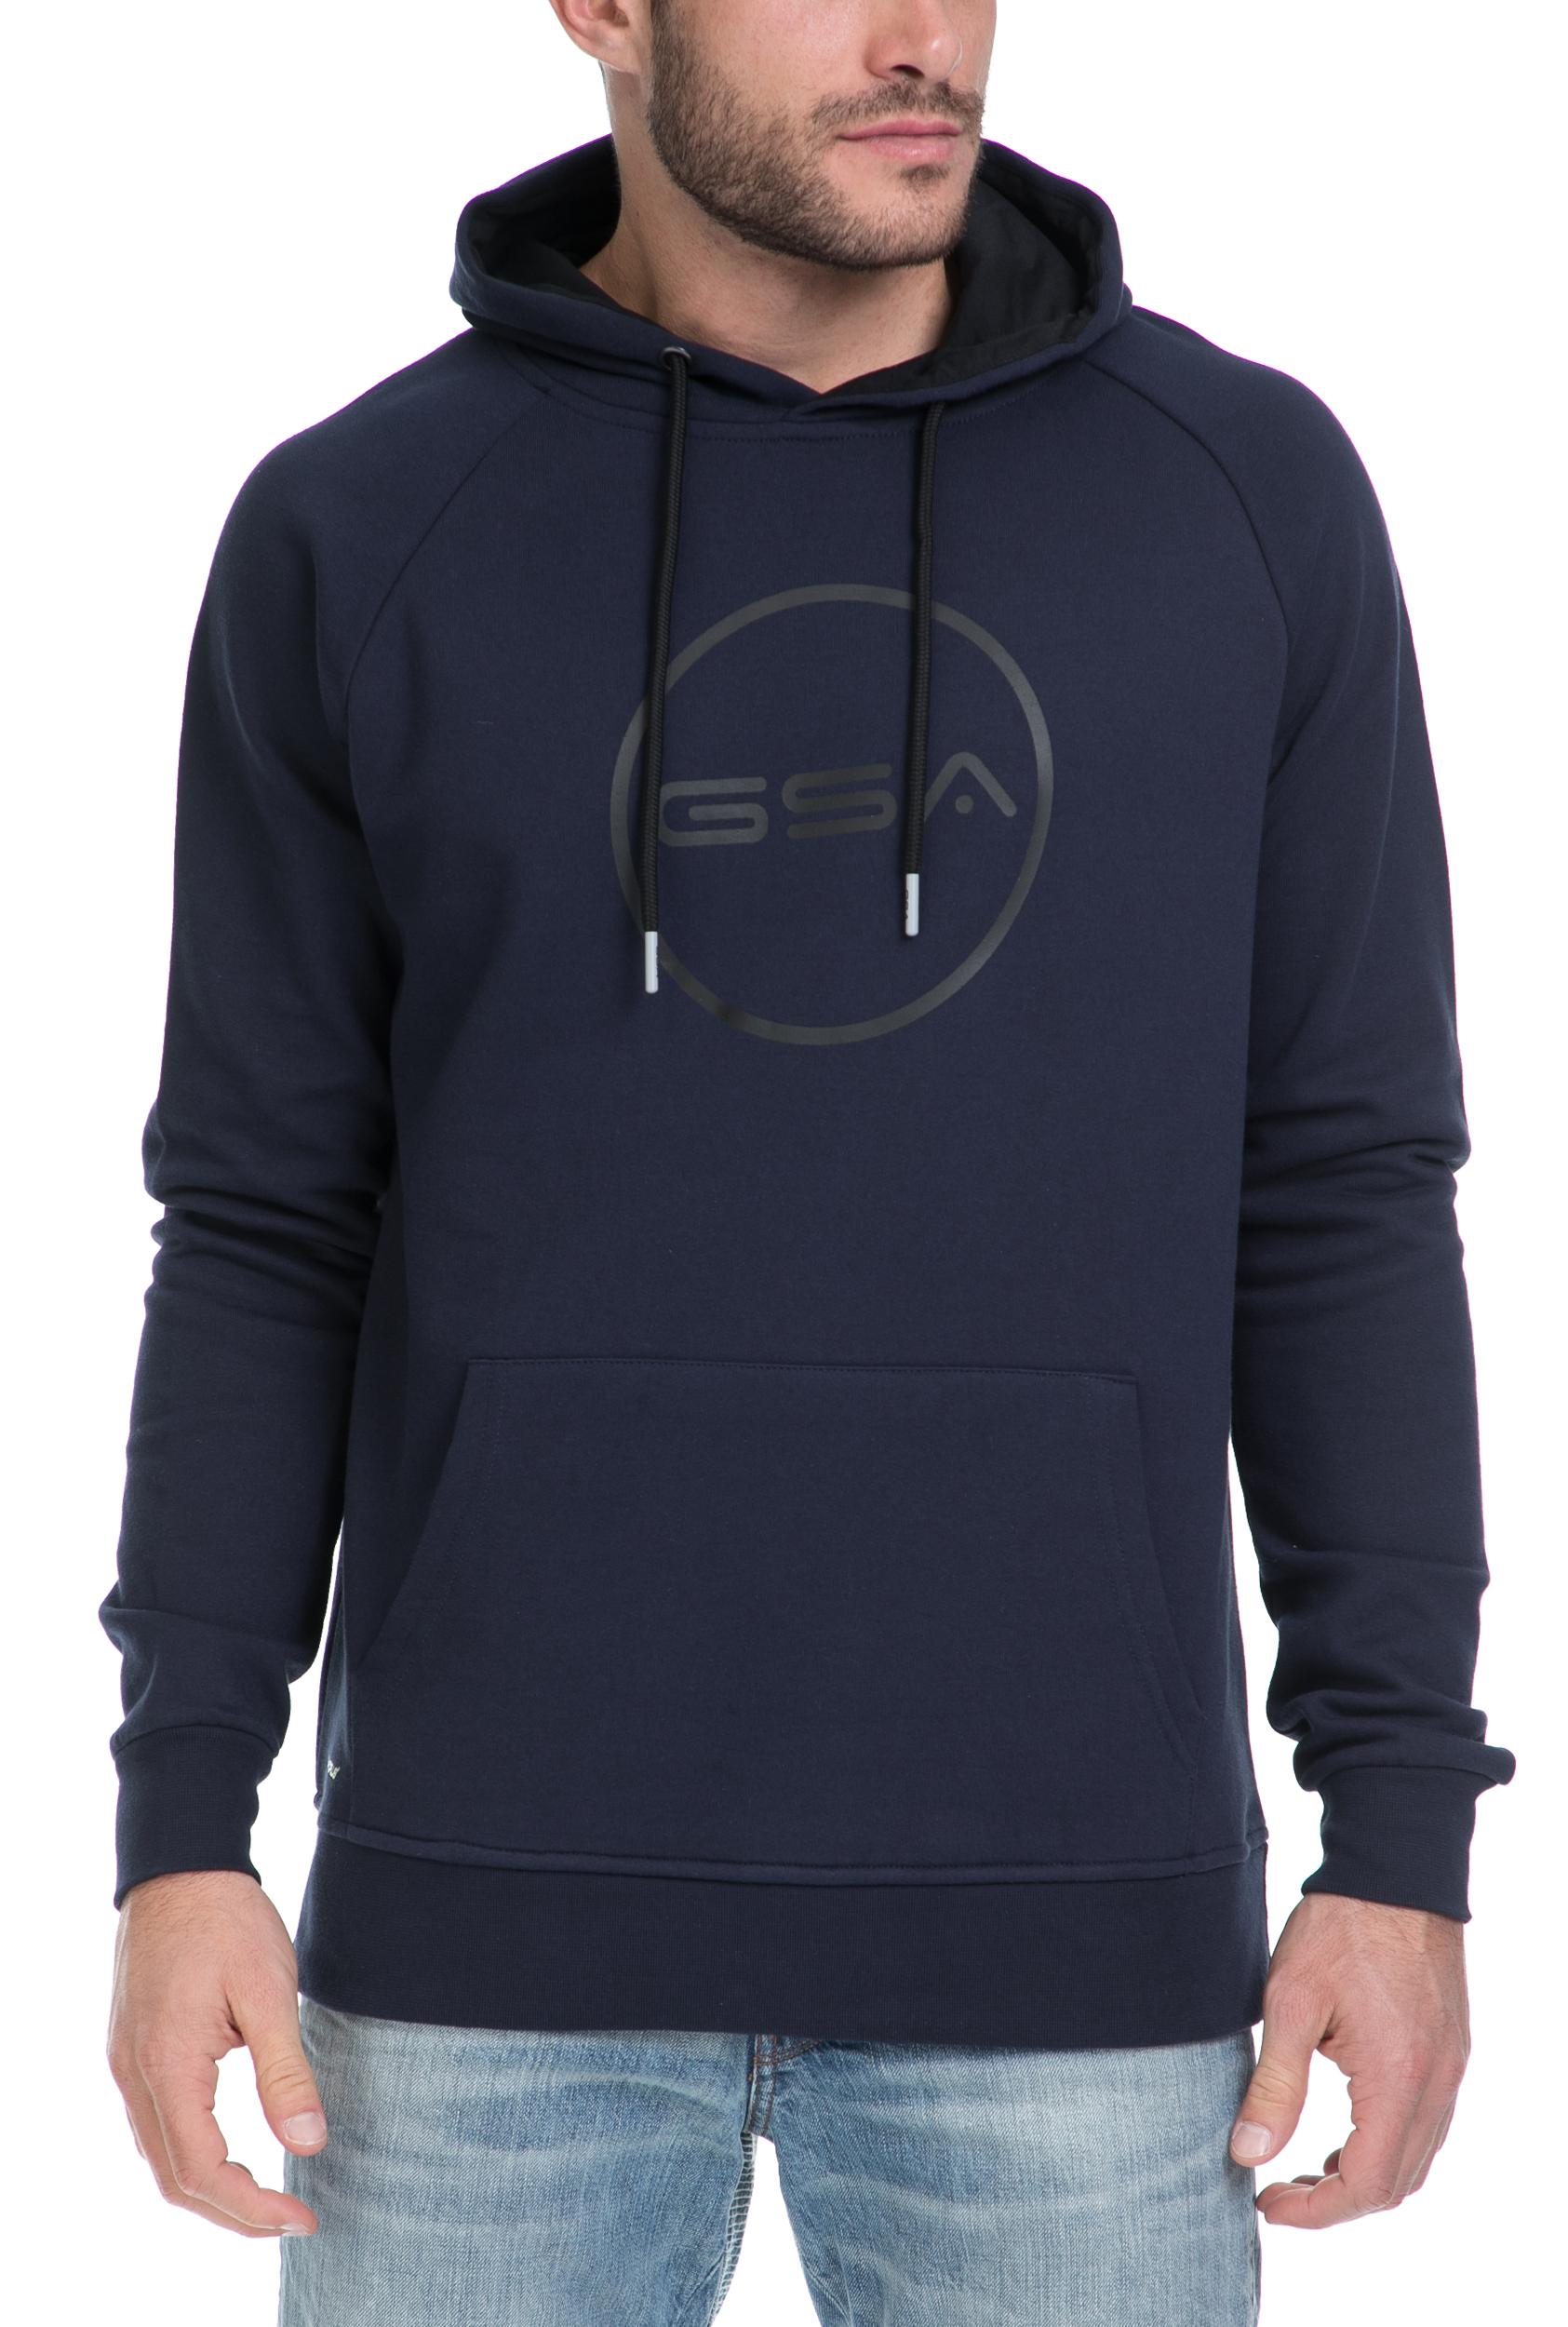 50935ef29abc GSA - Ανδρική φούτερ μπλούζα GSA PERFORMANCE μπλε. CollectiveOnline ...